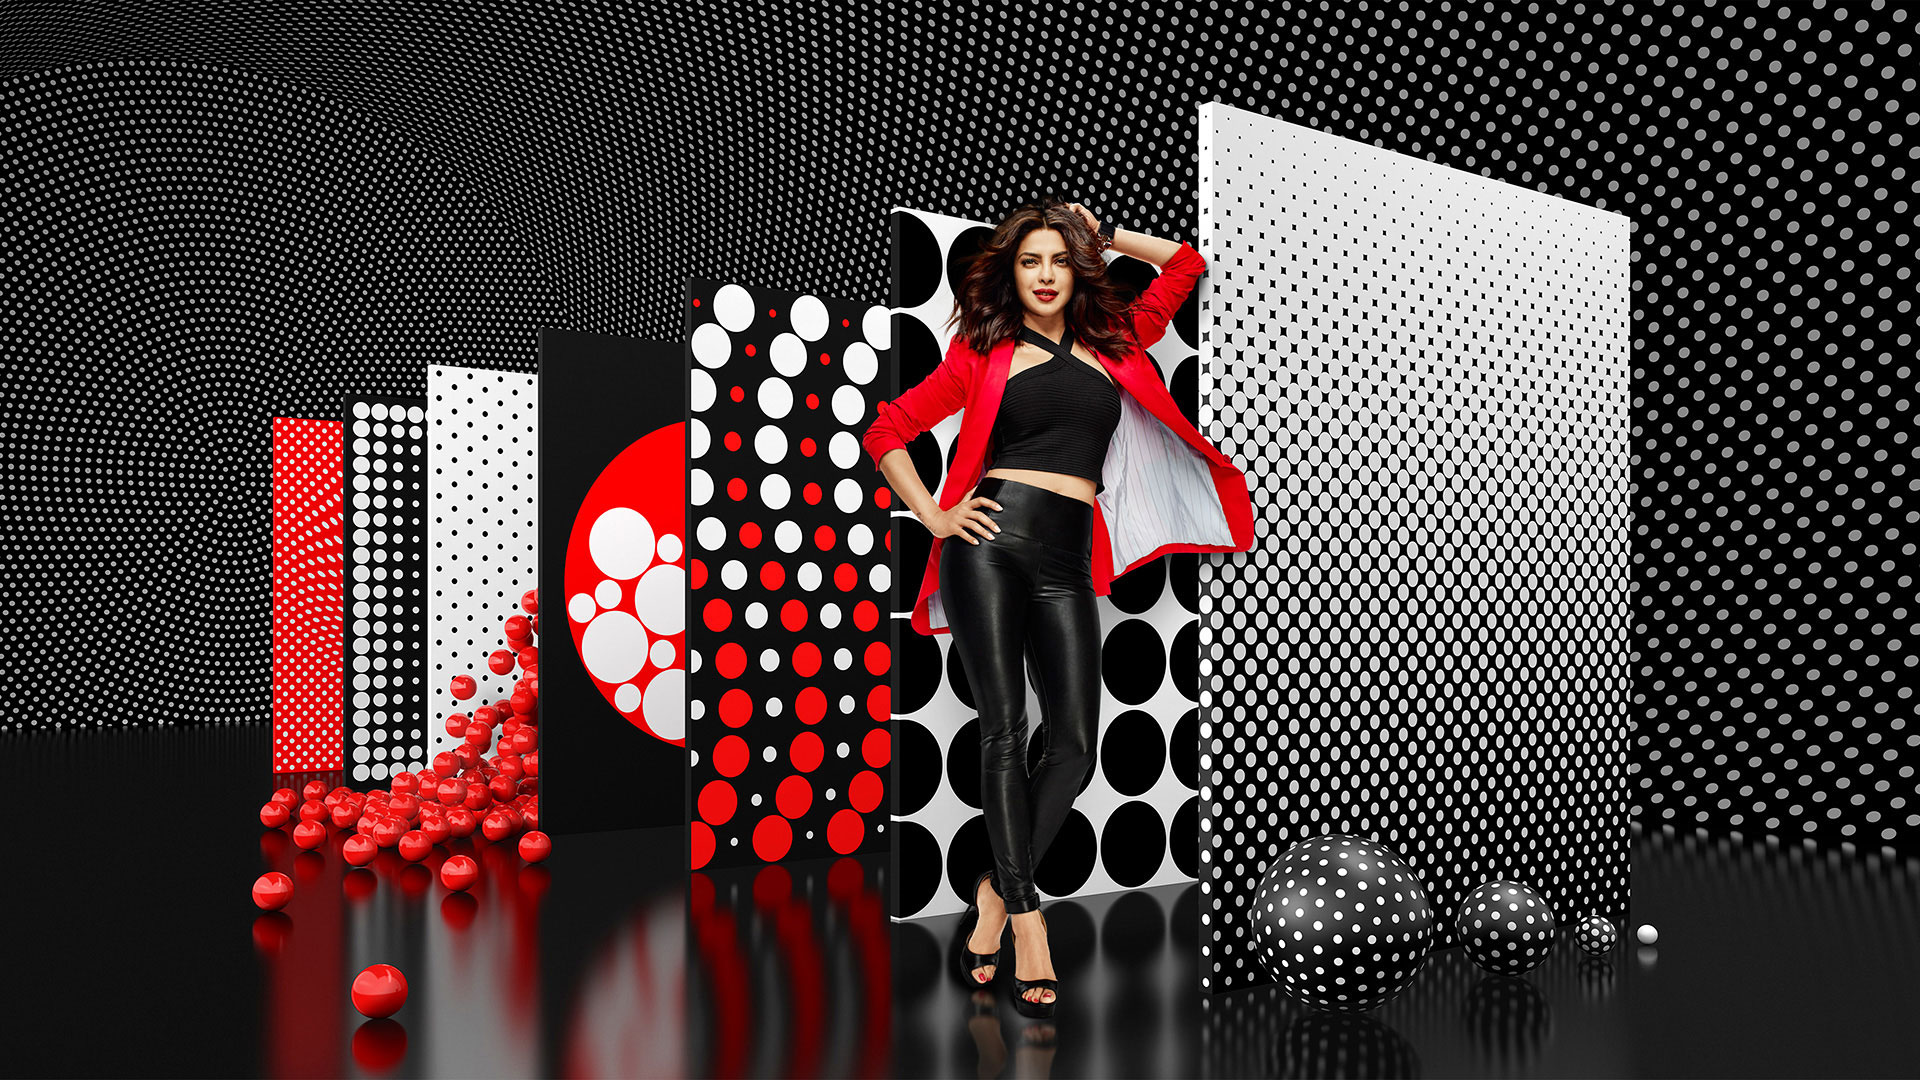 Priyanka Chopra в рекламной кампании Appy Fizz